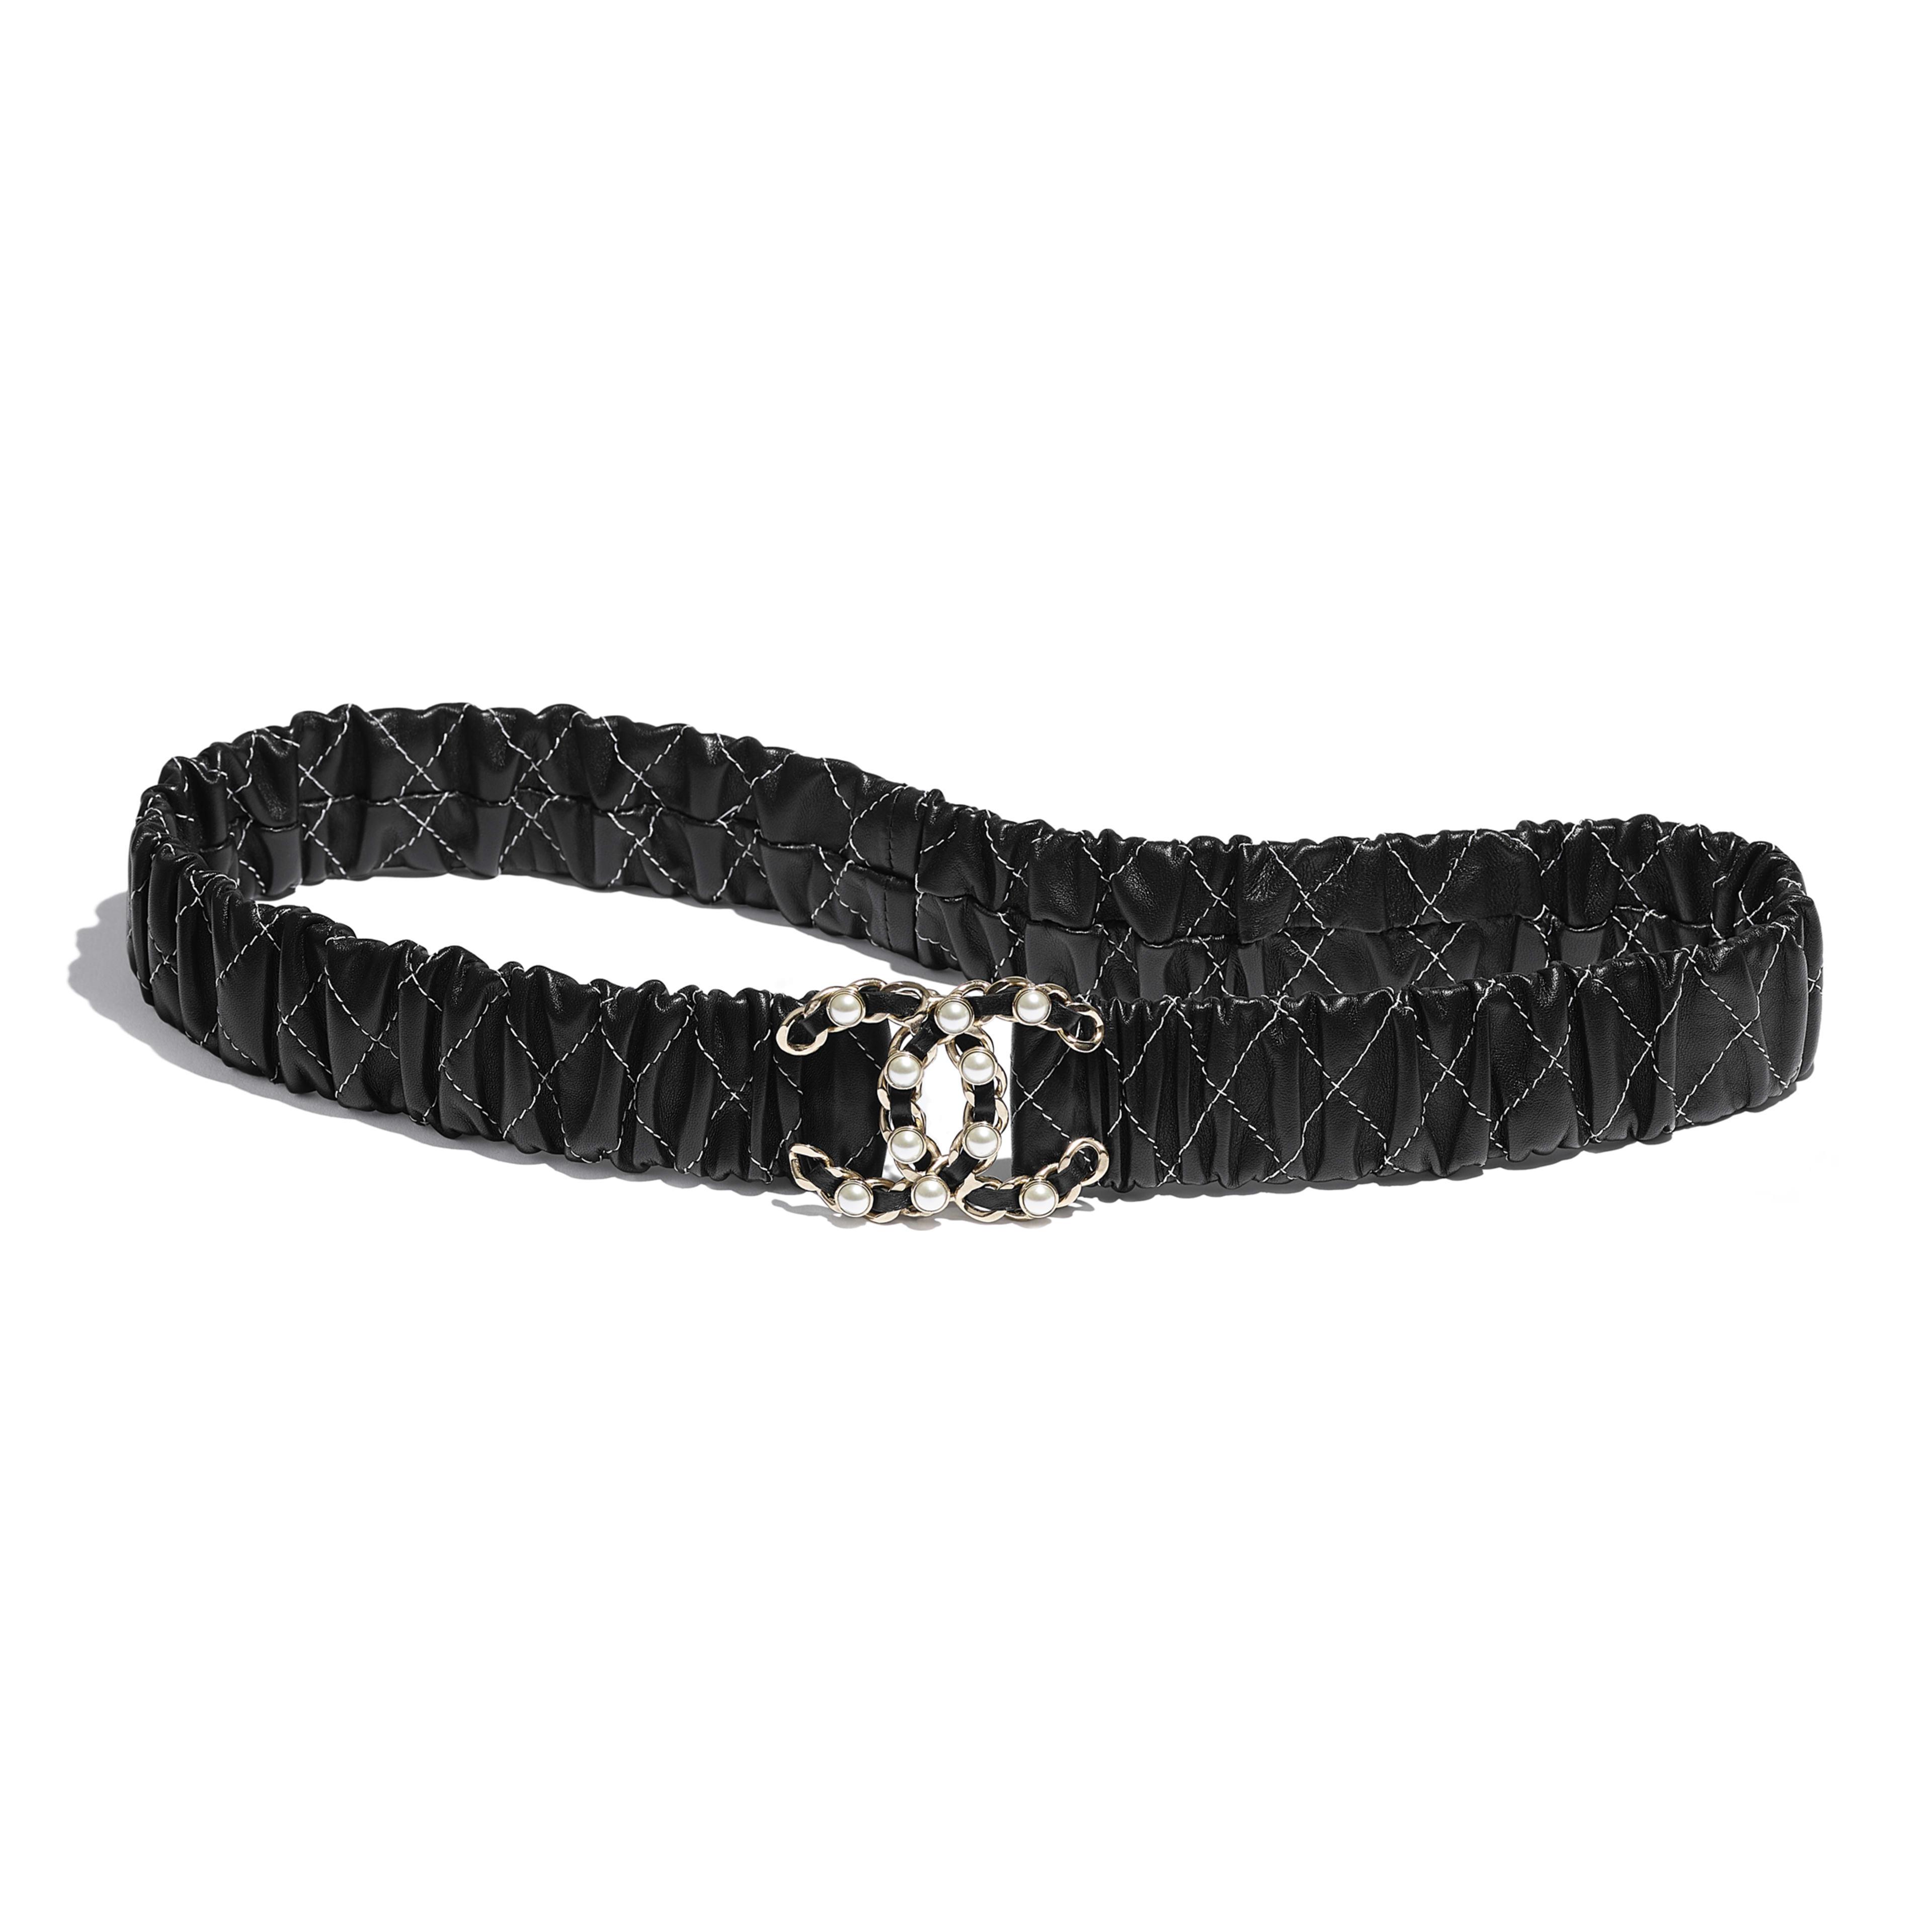 Belt - Black - Lambskin, Gold-Tone Metal & Glass Pearls - Default view - see full sized version